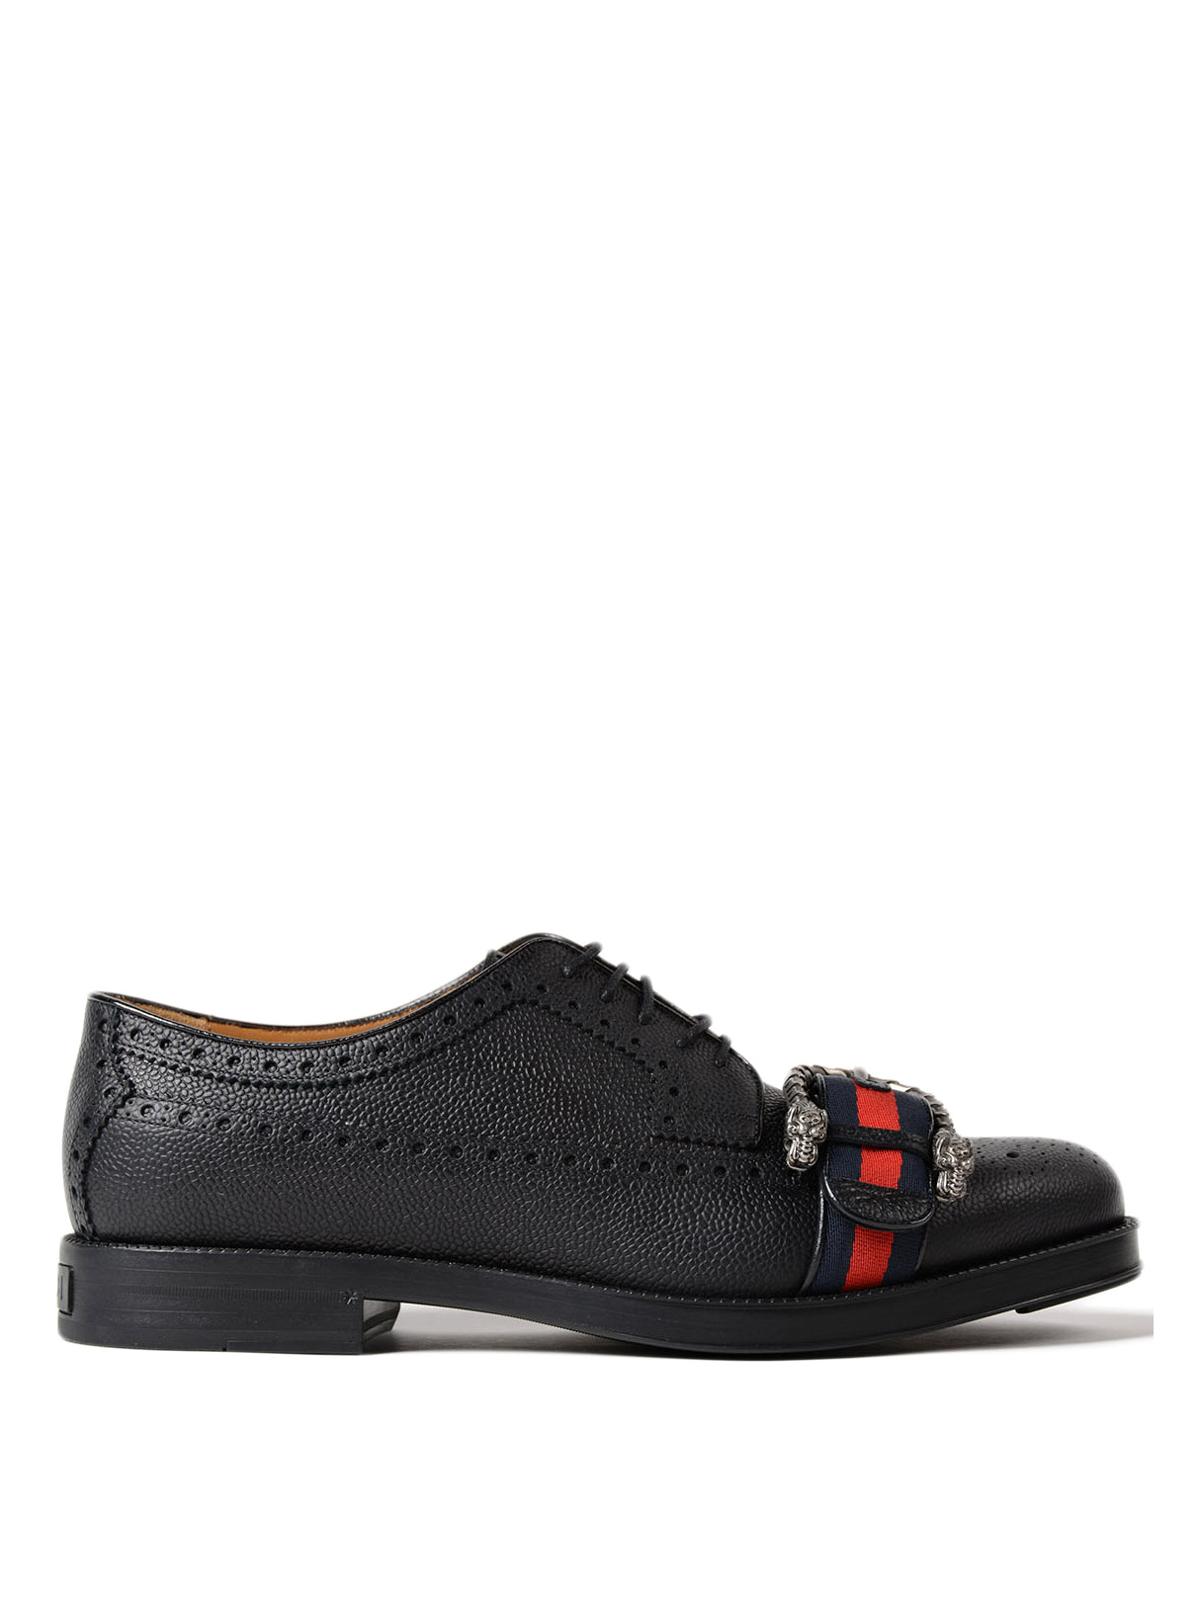 Gucci - Zapatos Con Cordones - Negro - Zapatos con cordones ... e7445fd34e6